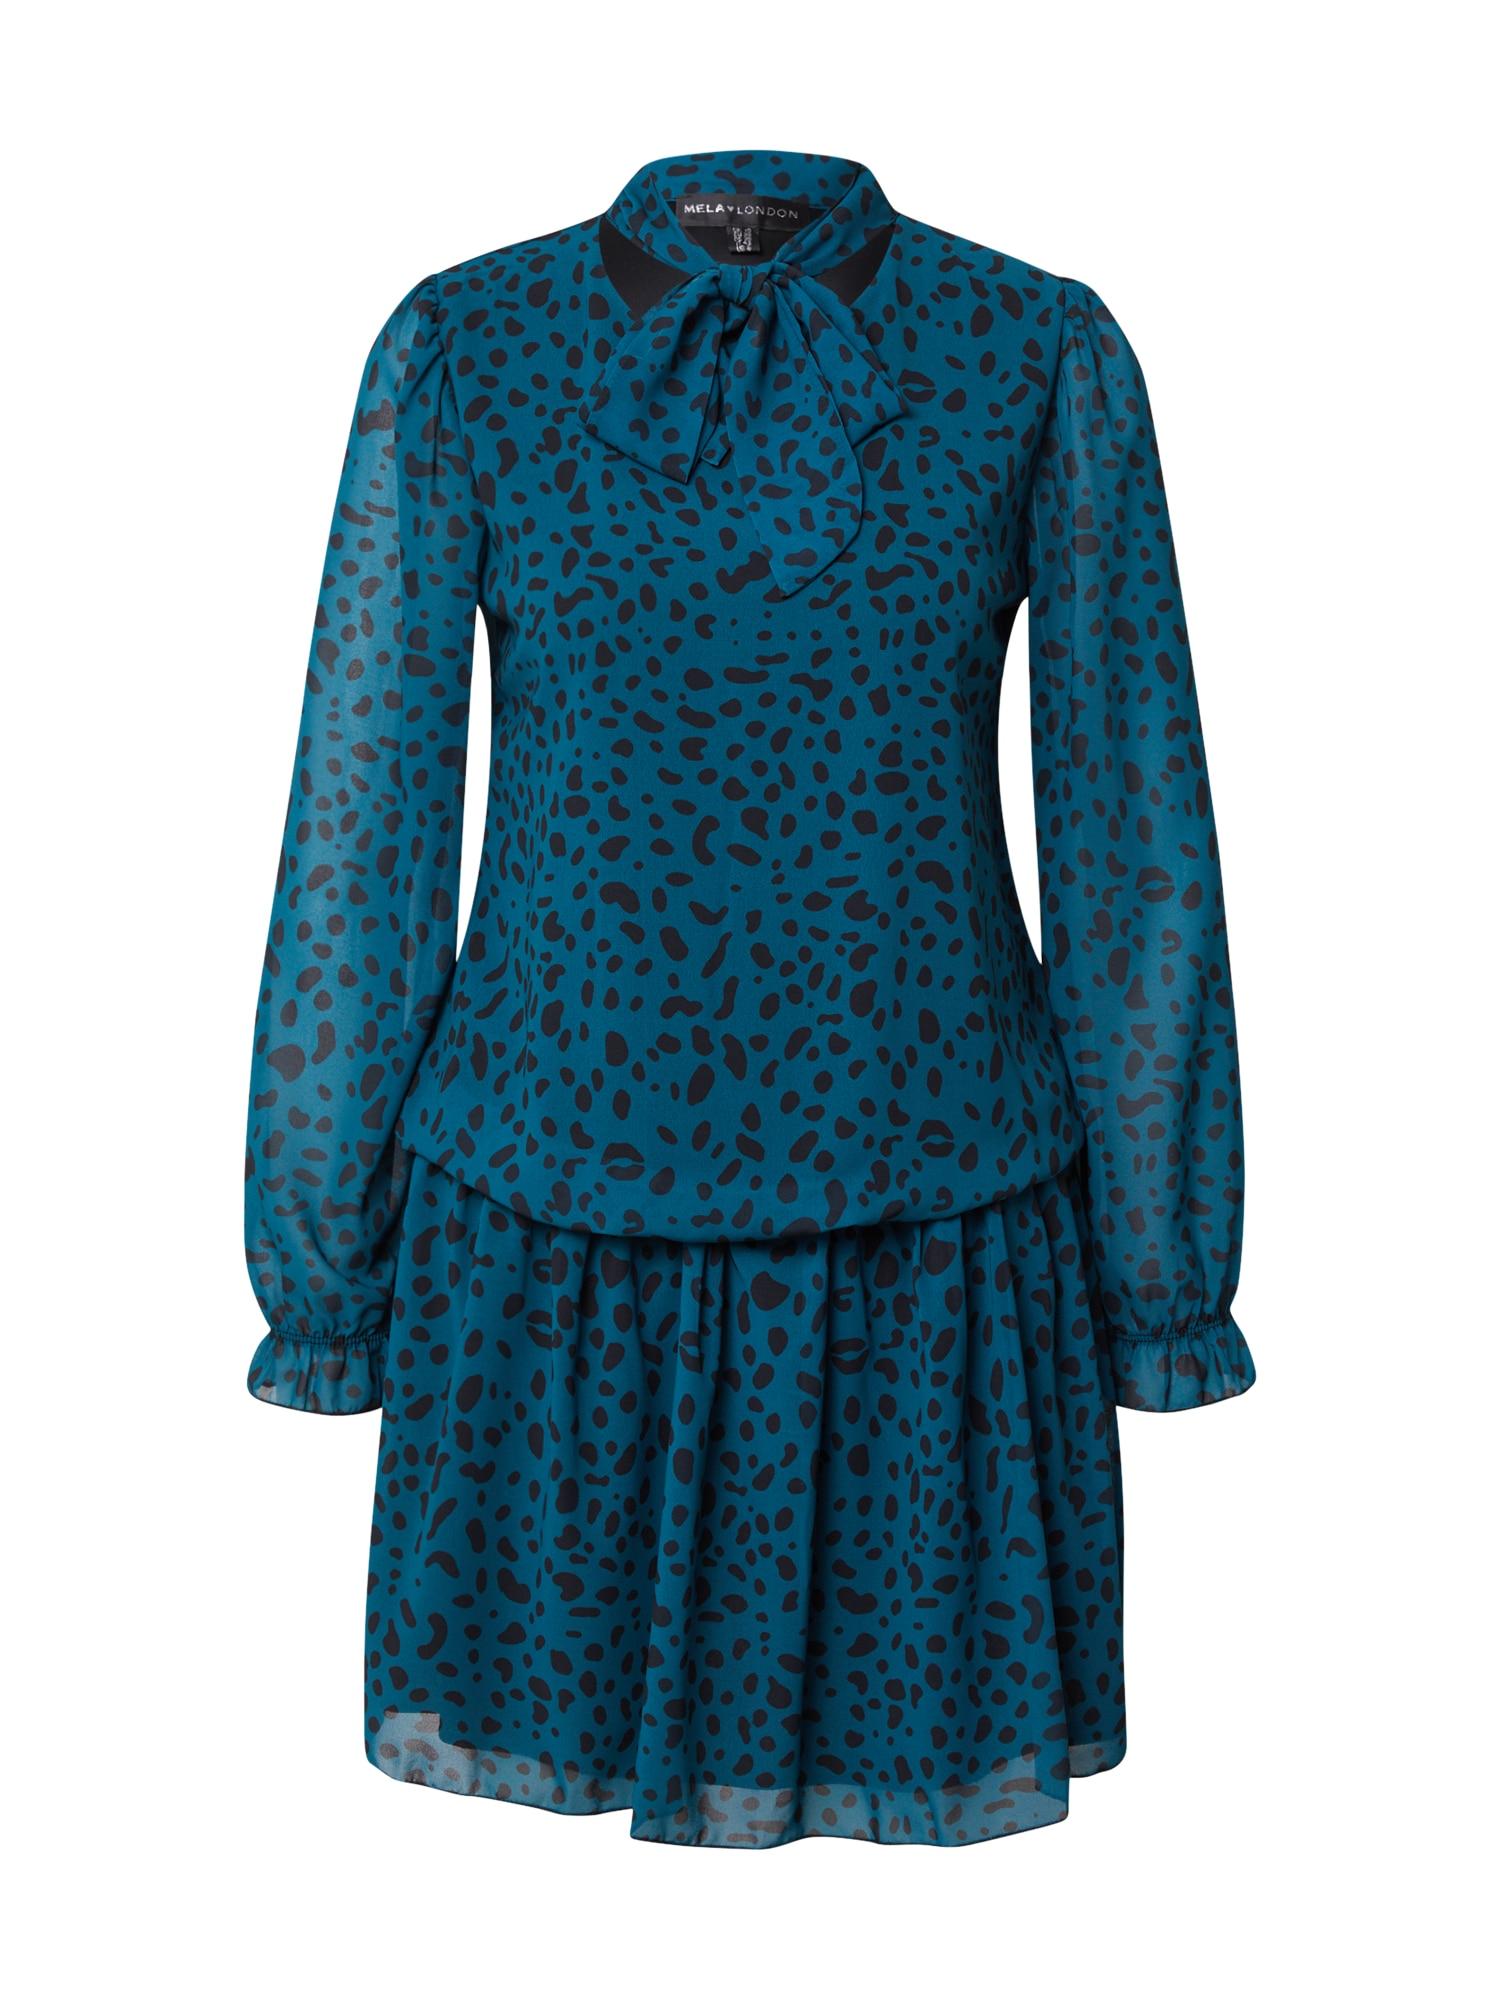 Mela London Suknelė pastelinė mėlyna / nakties mėlyna